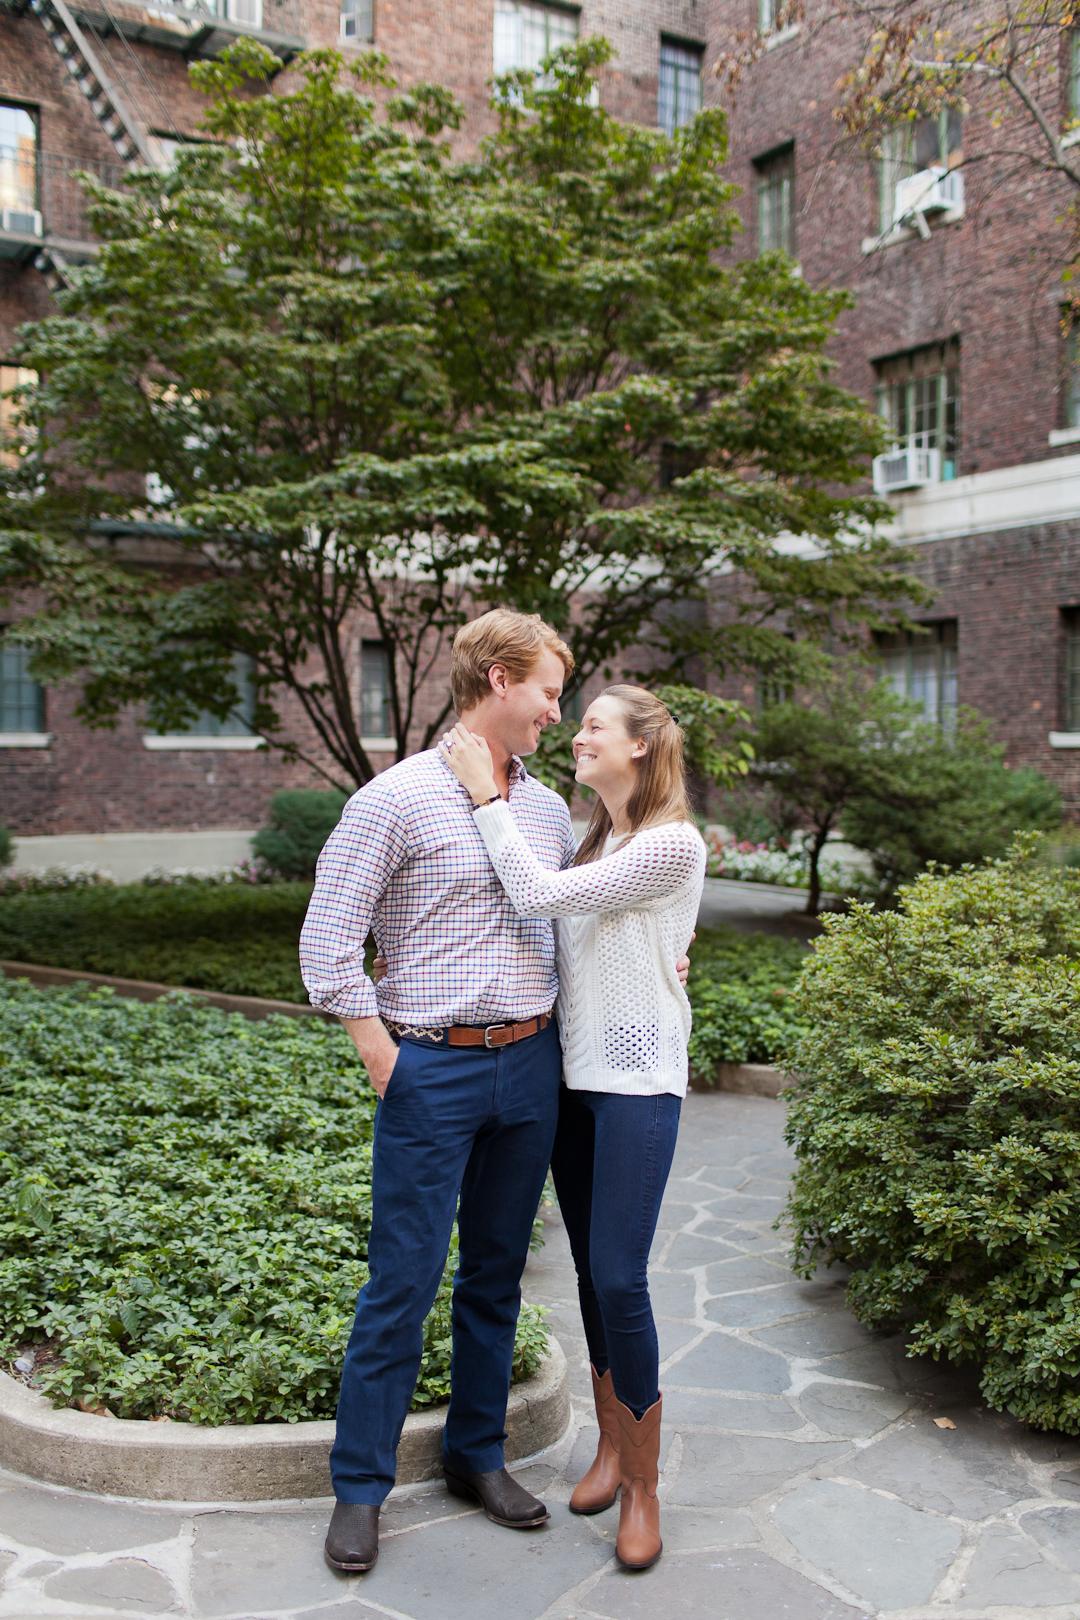 Melissa Kruse Photography - Megan & Tyler West Village Engagement Photos-5.jpg